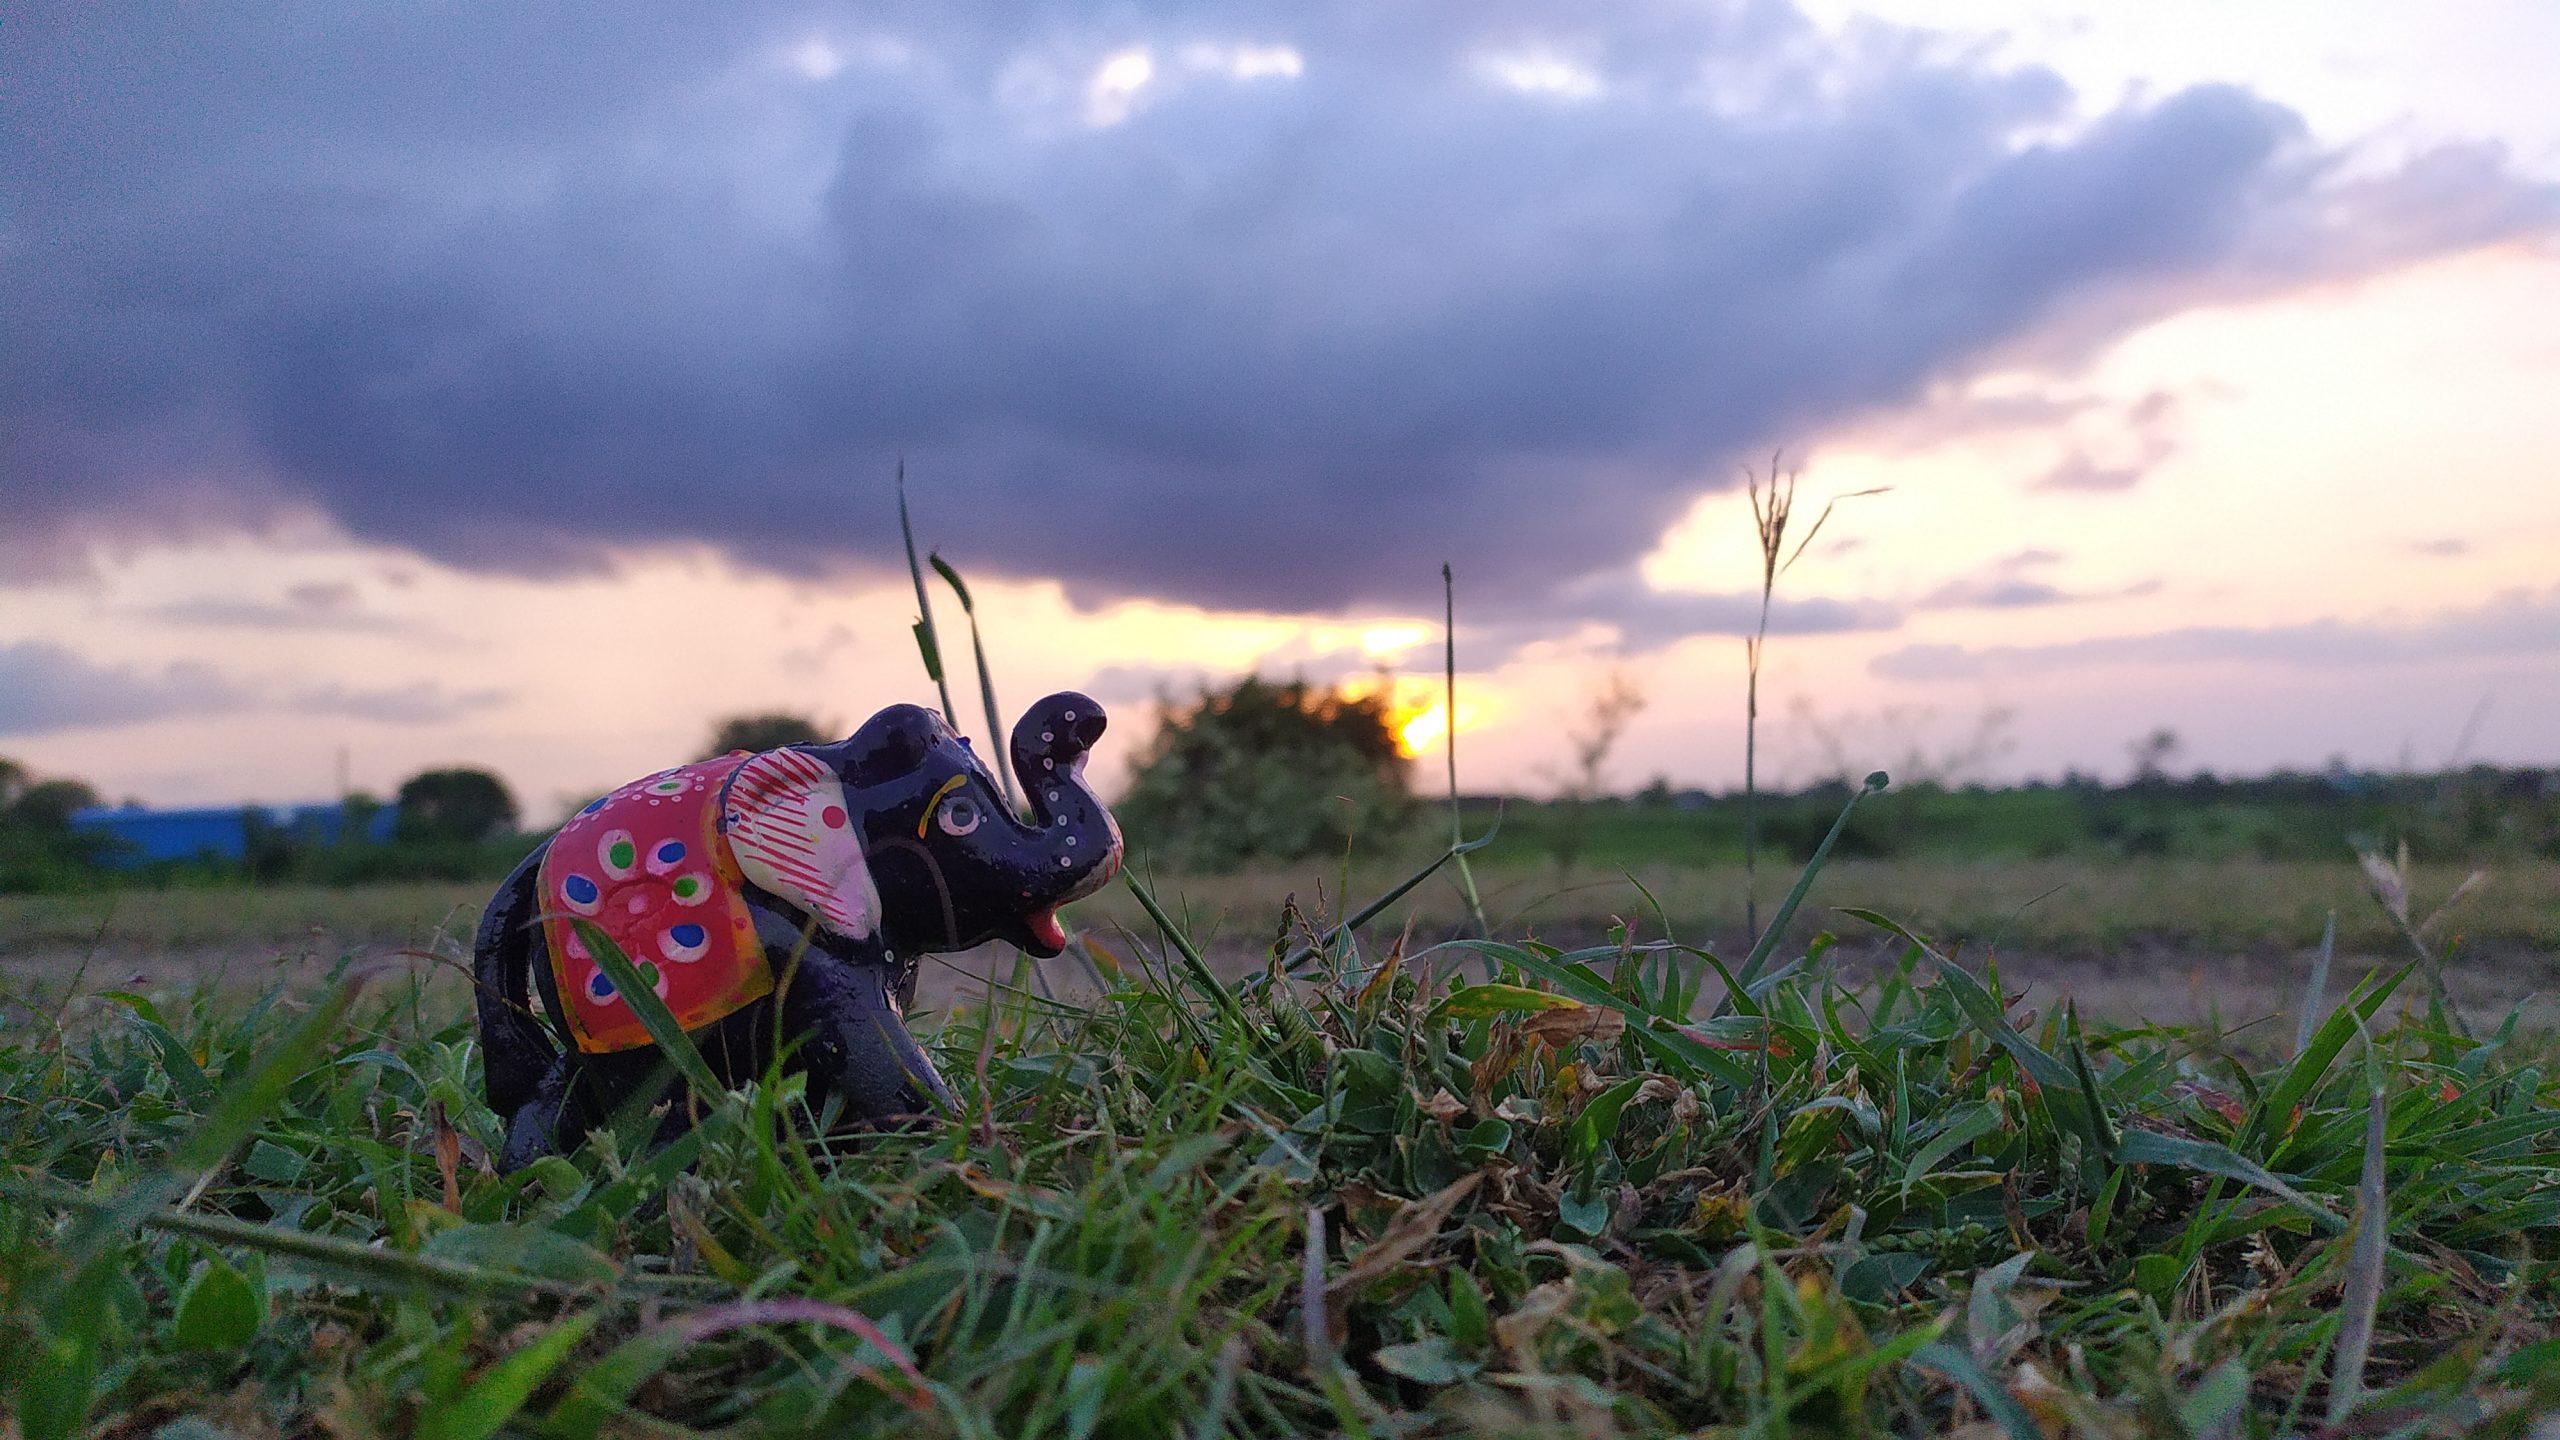 A toy elephant on grass